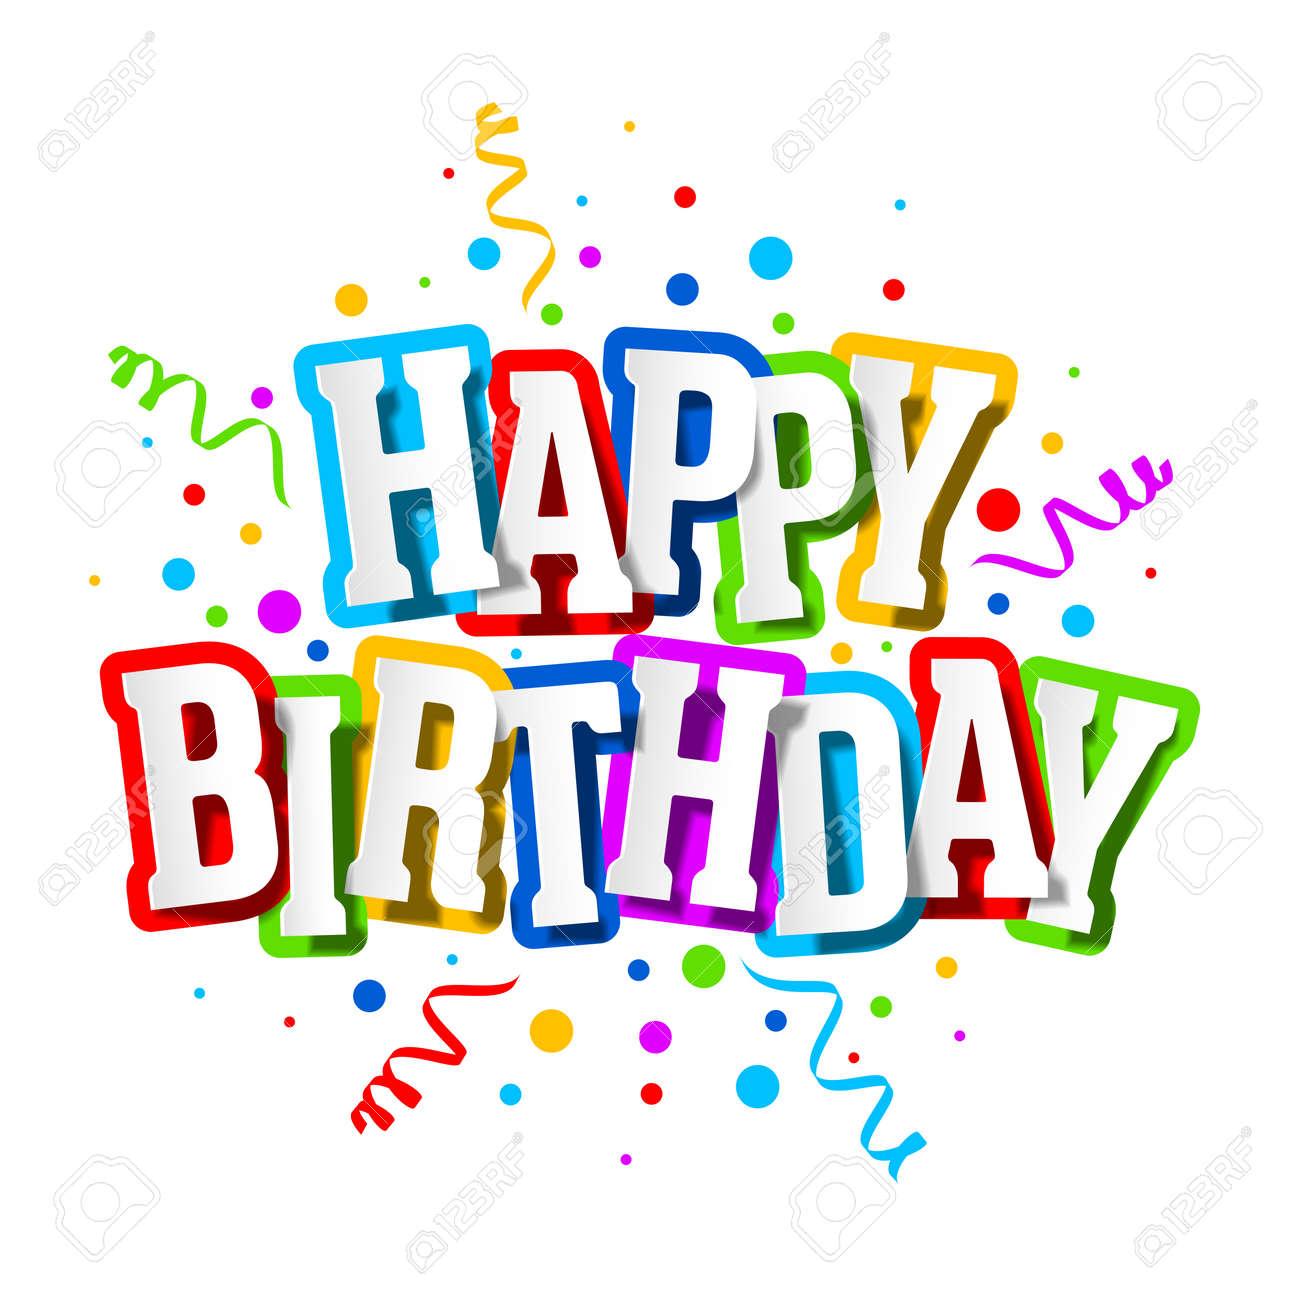 Happy Birthday Greeting Card - 54980388